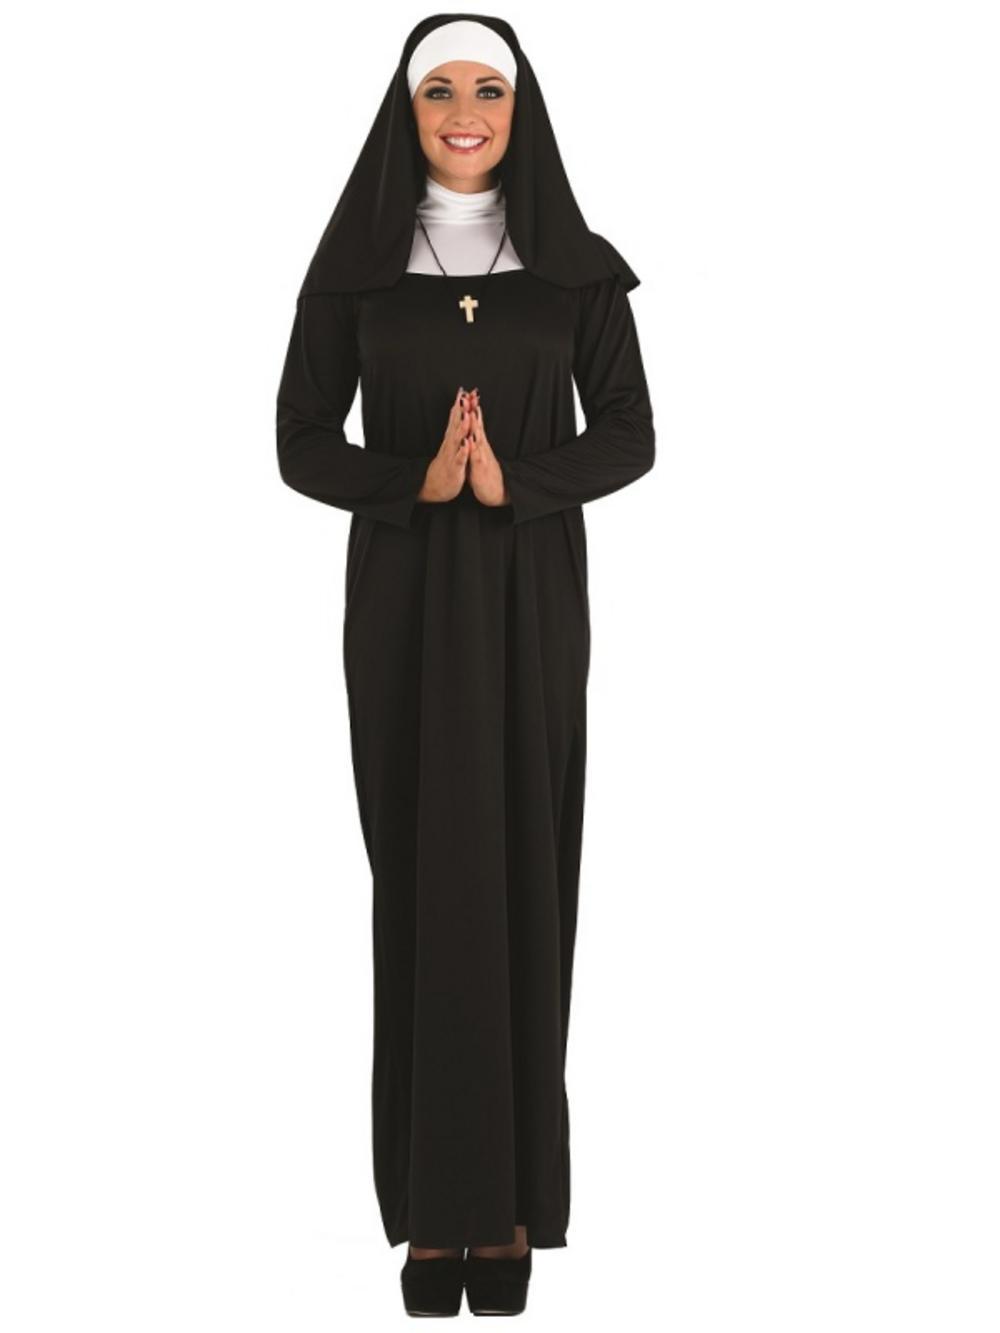 Ladies Nun Fancy Dress Costume